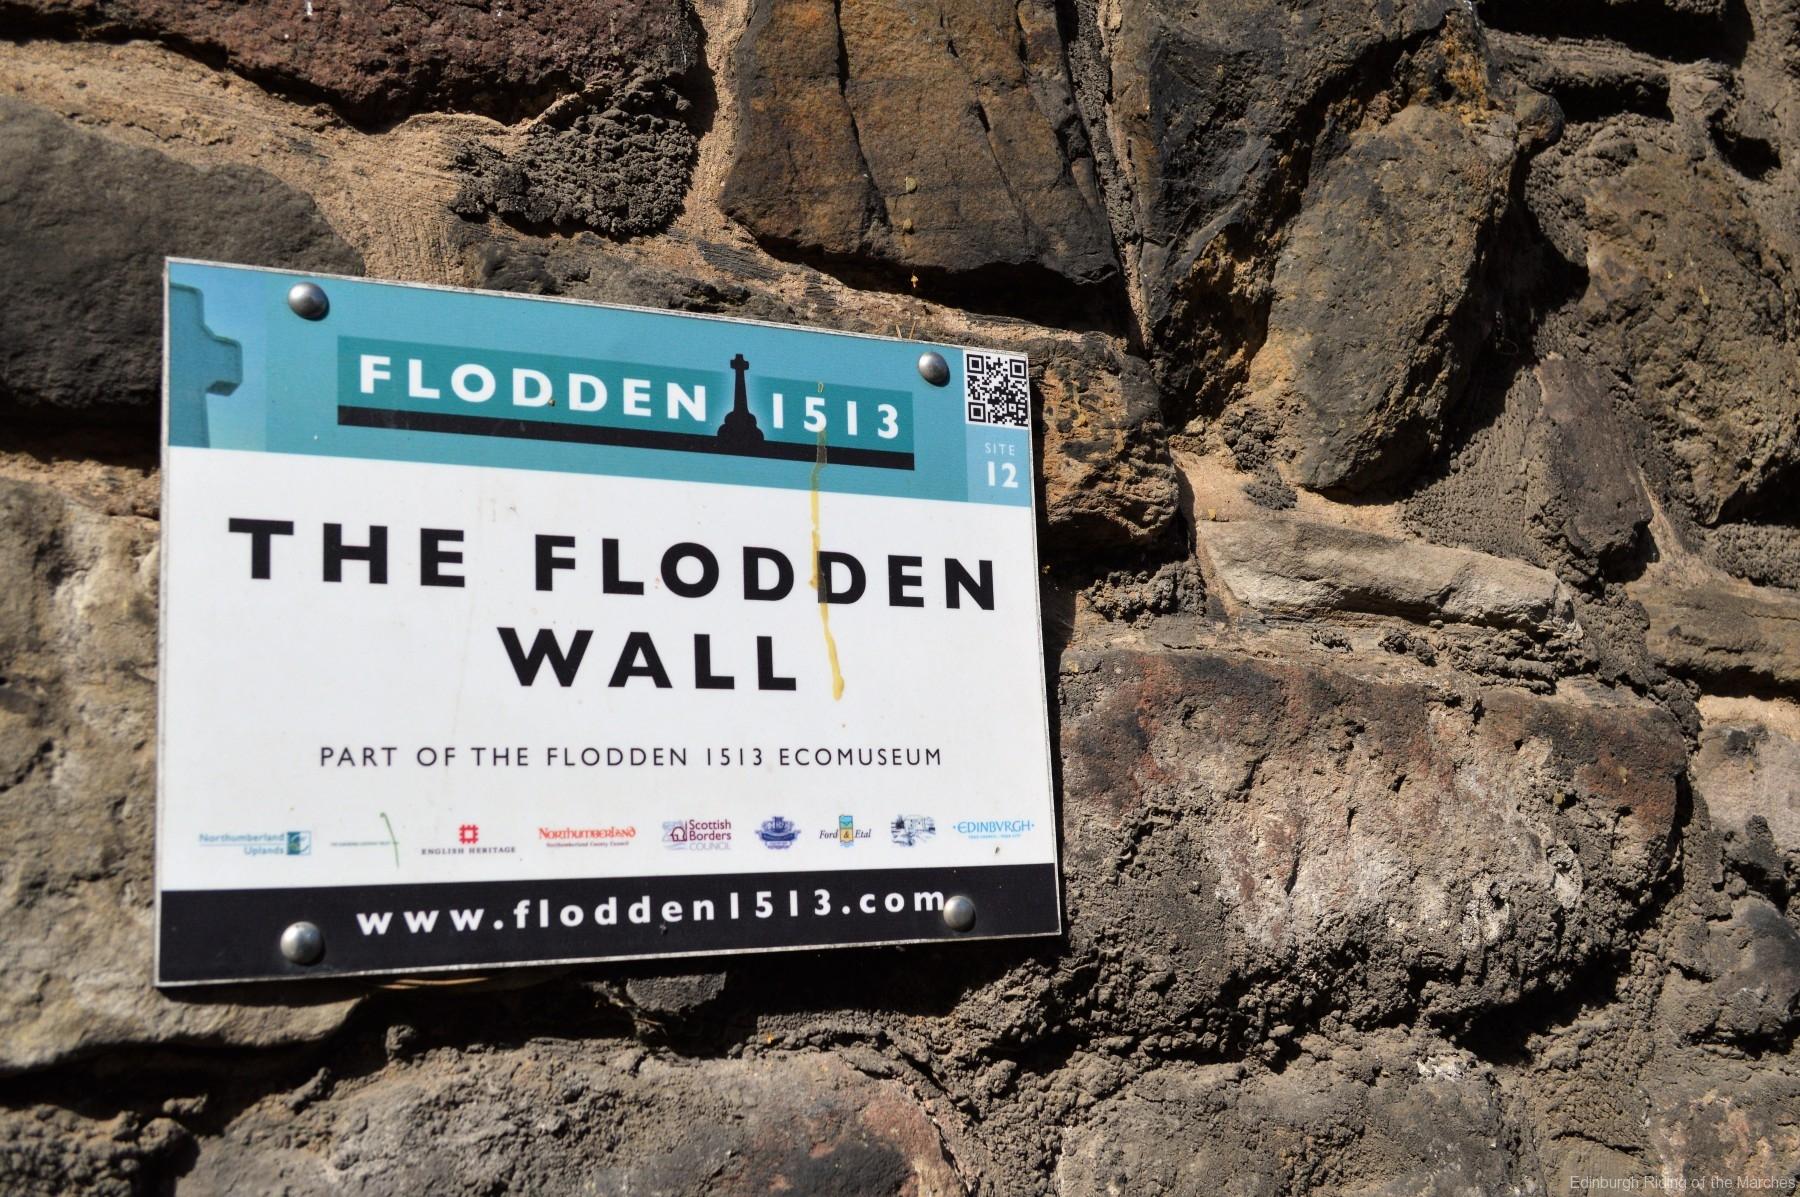 Flodden Wall plaque